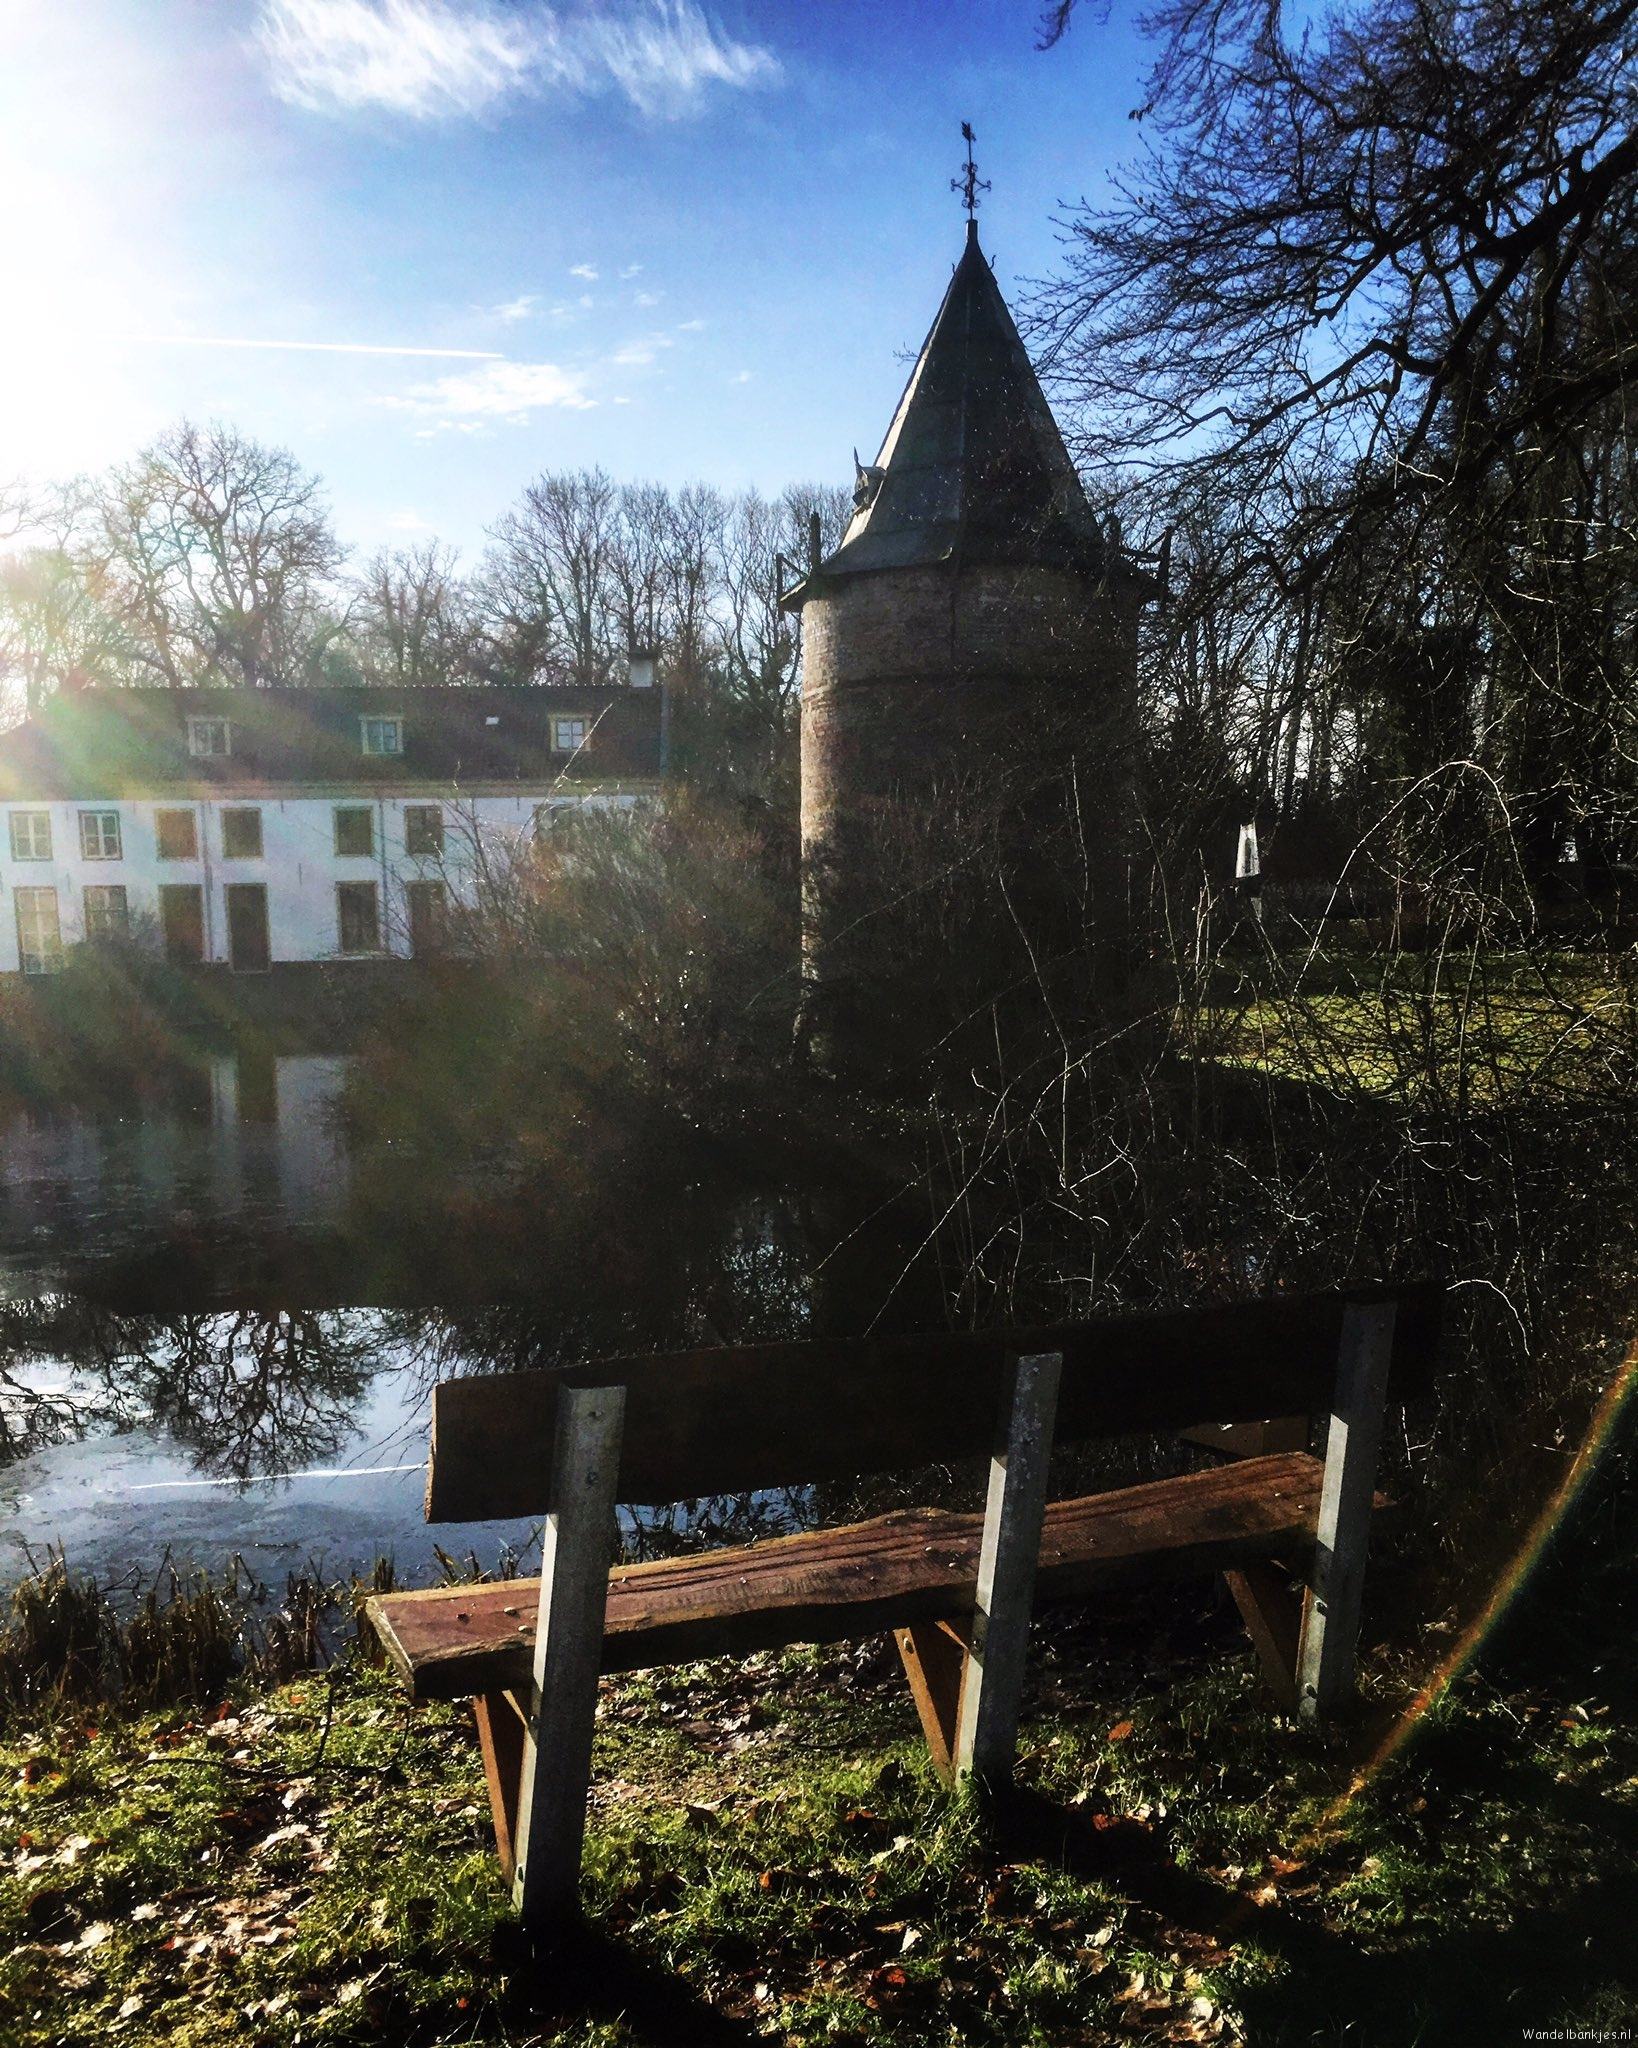 rt-tmowind-estate-wickenburgh-t-goy-gem-wooden-walking-benches-https-t-co-pw92kuwfpu